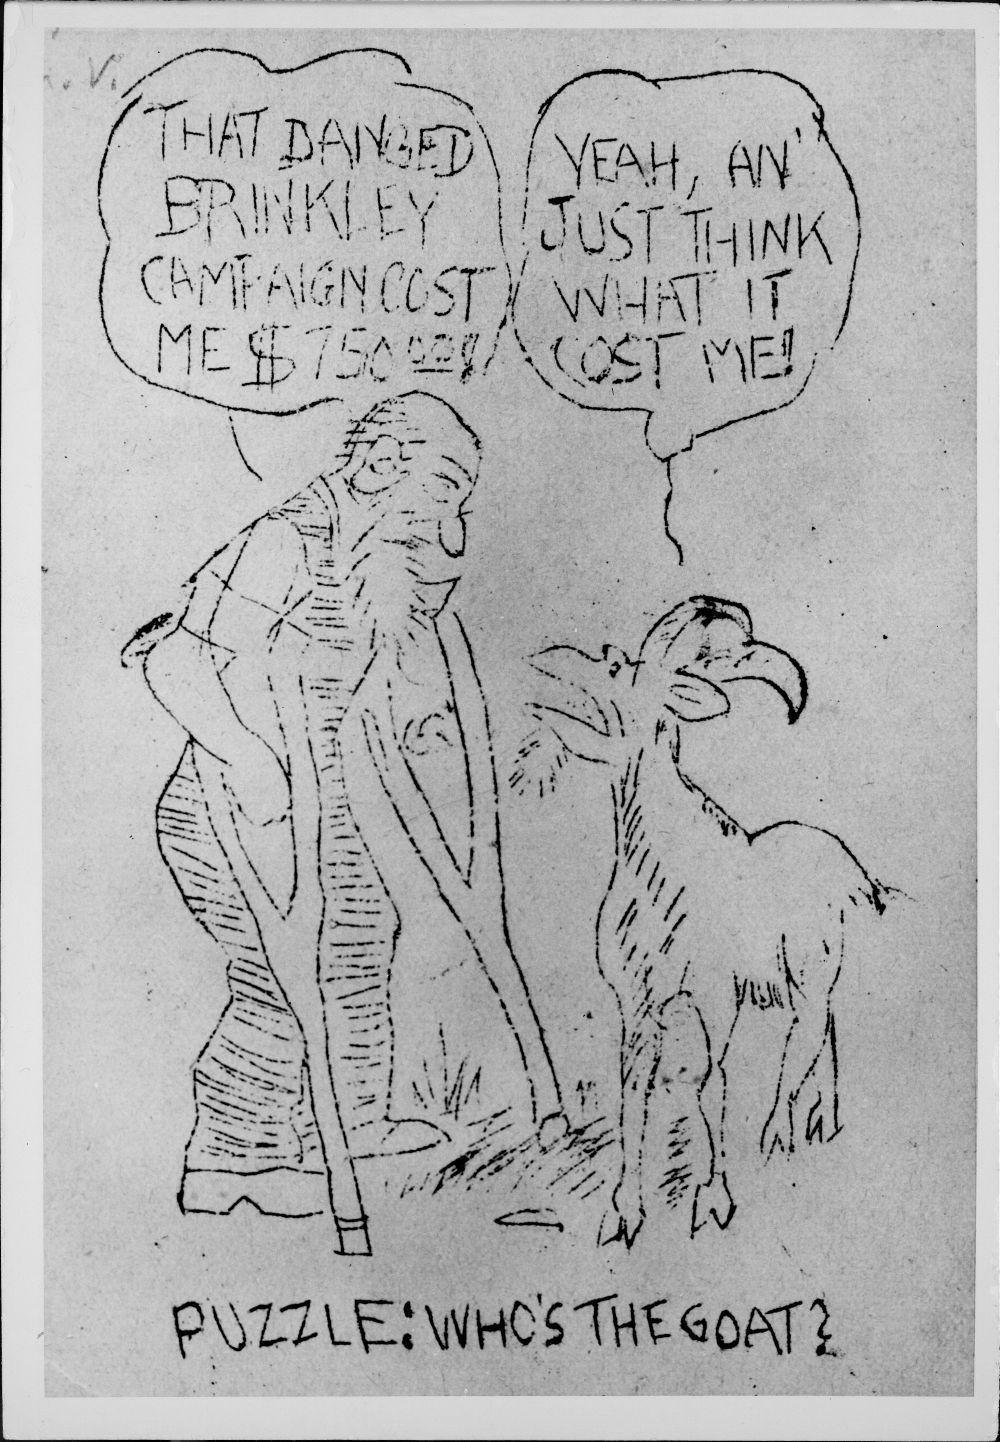 Political cartoon concerning Dr. John R. Brinkley